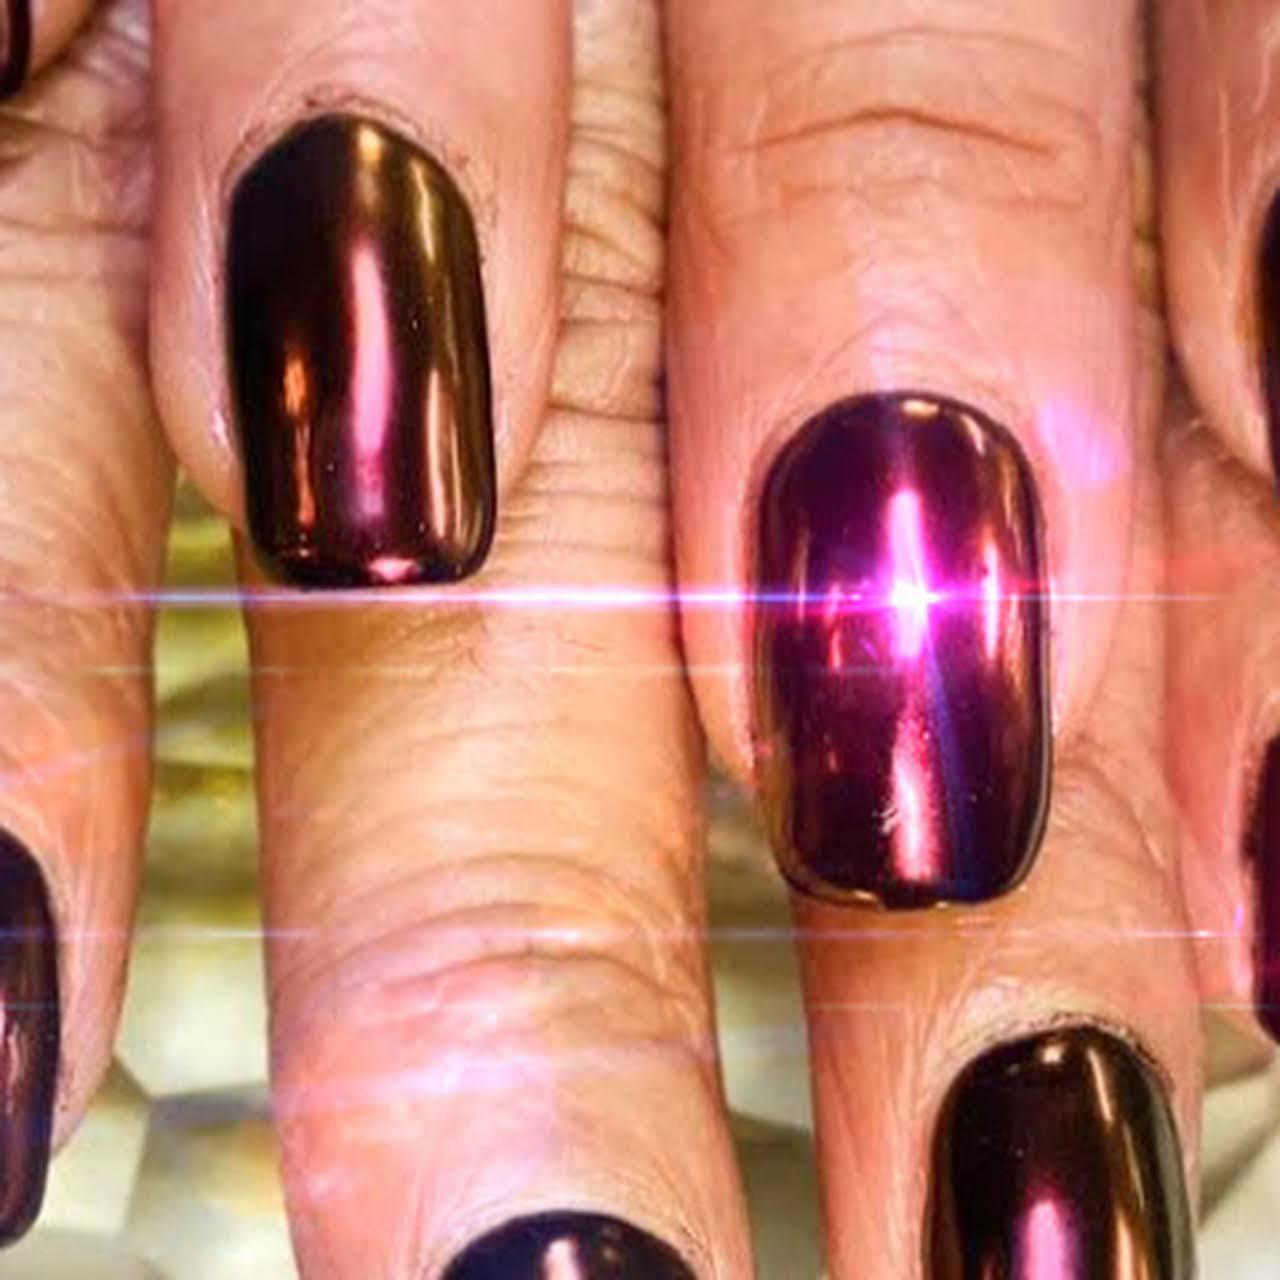 Too Q Nails & Spa - Nail Salon in Houston